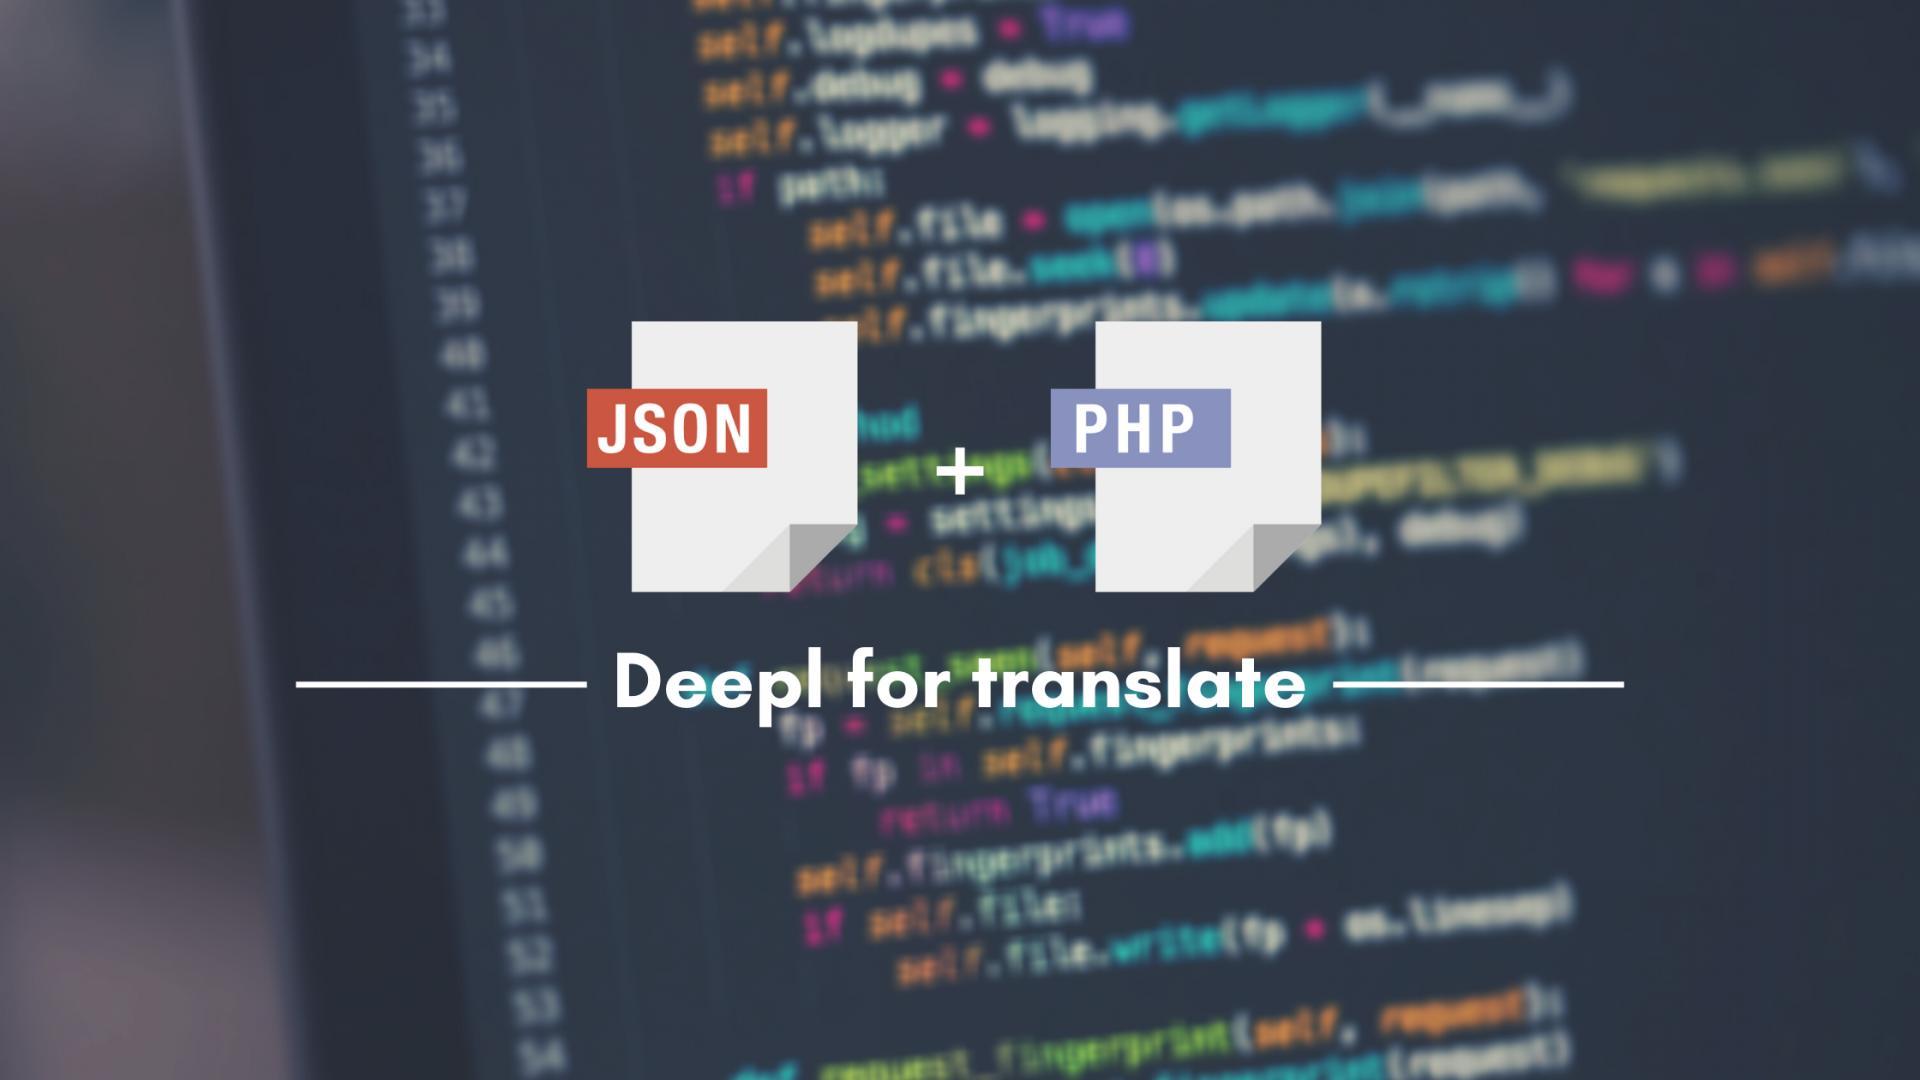 Using the Deepl API